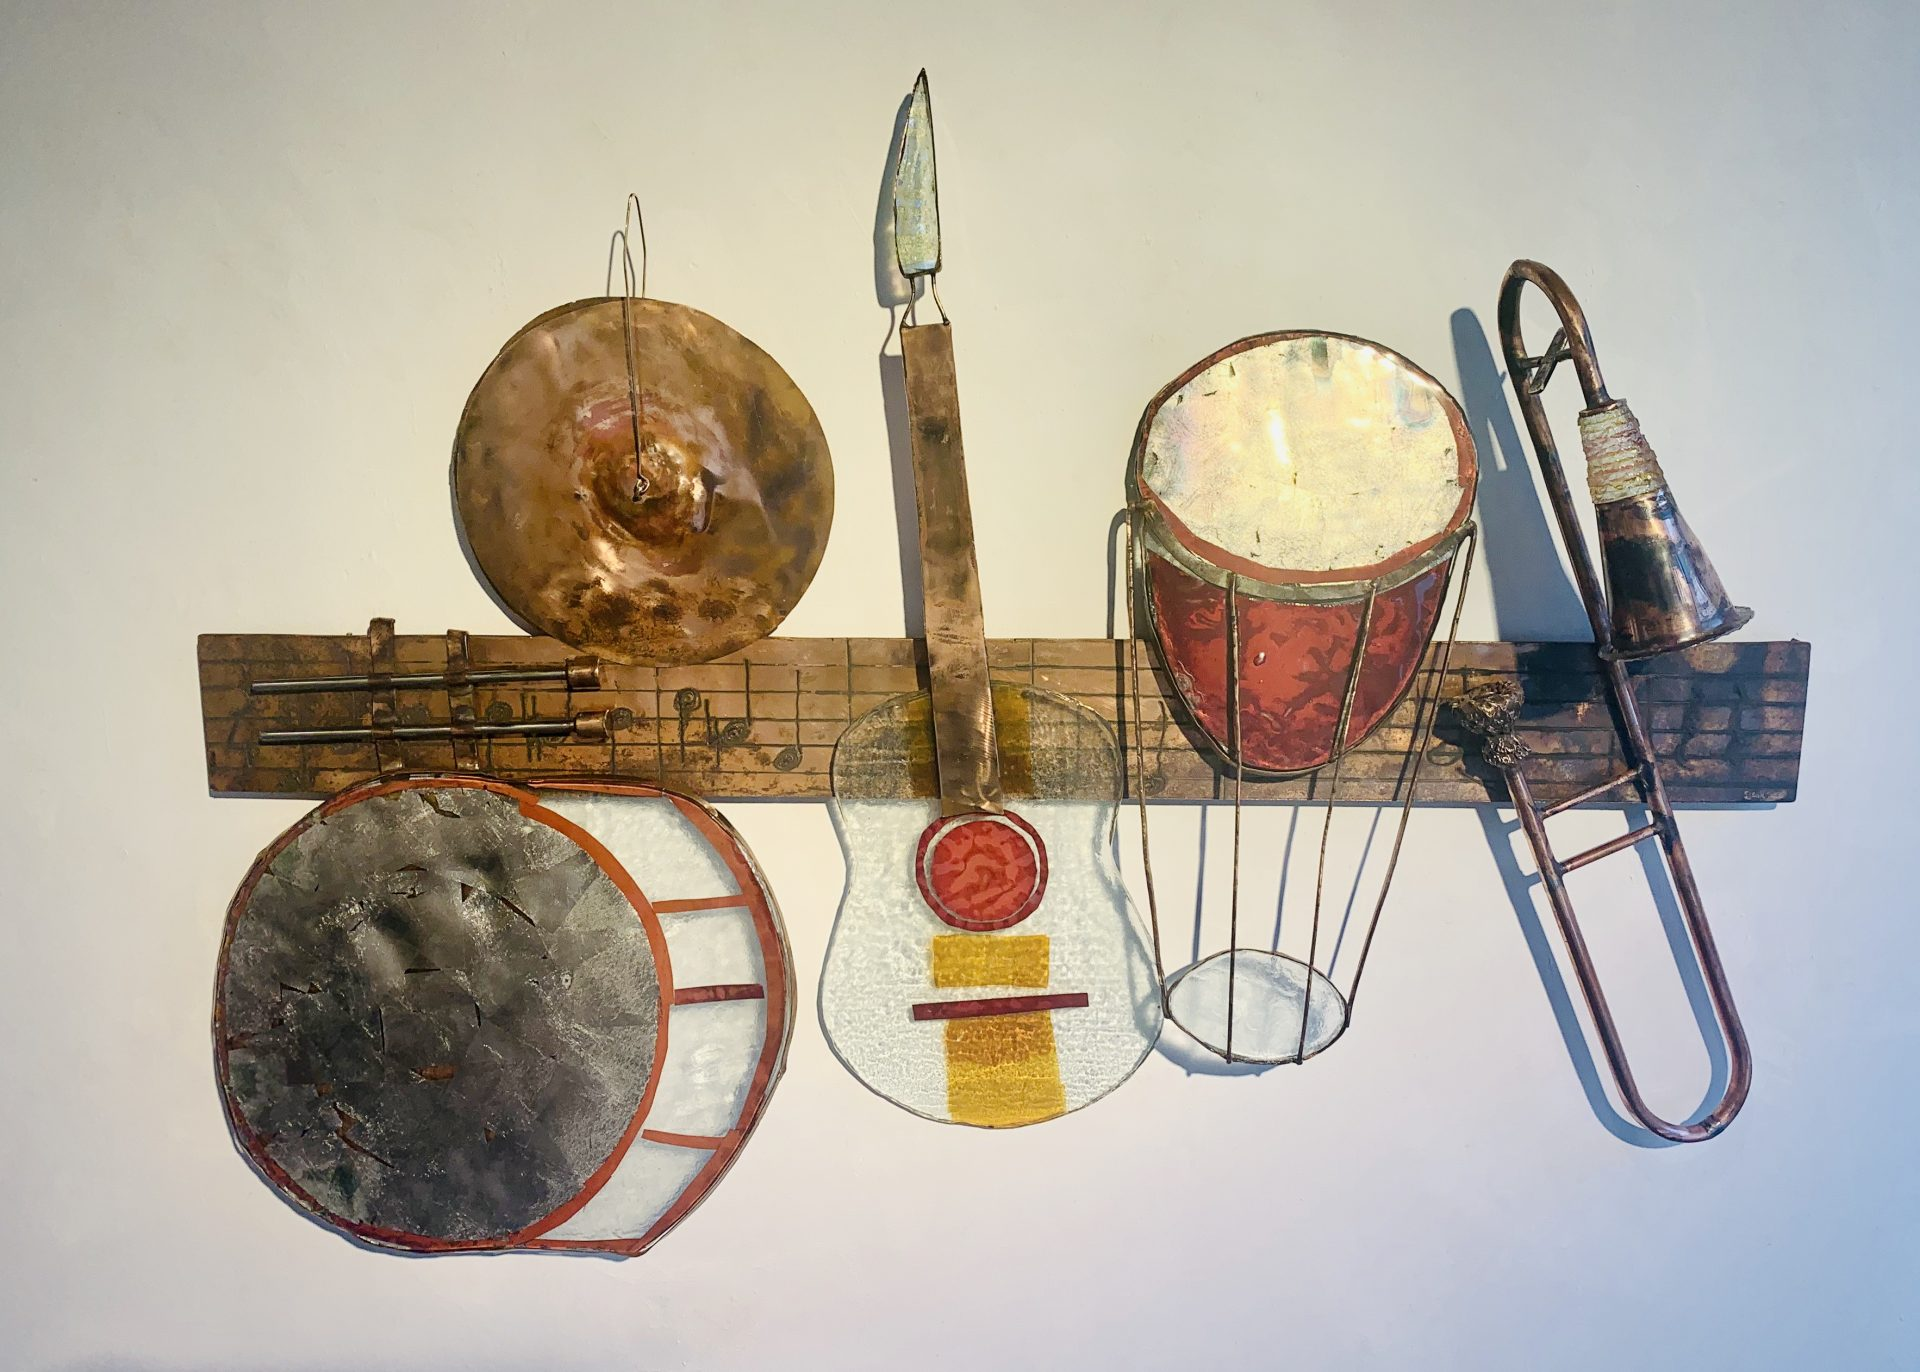 Wandobject muziekinstrumenten klant Funs Uiting SJAAK SMETSERS5